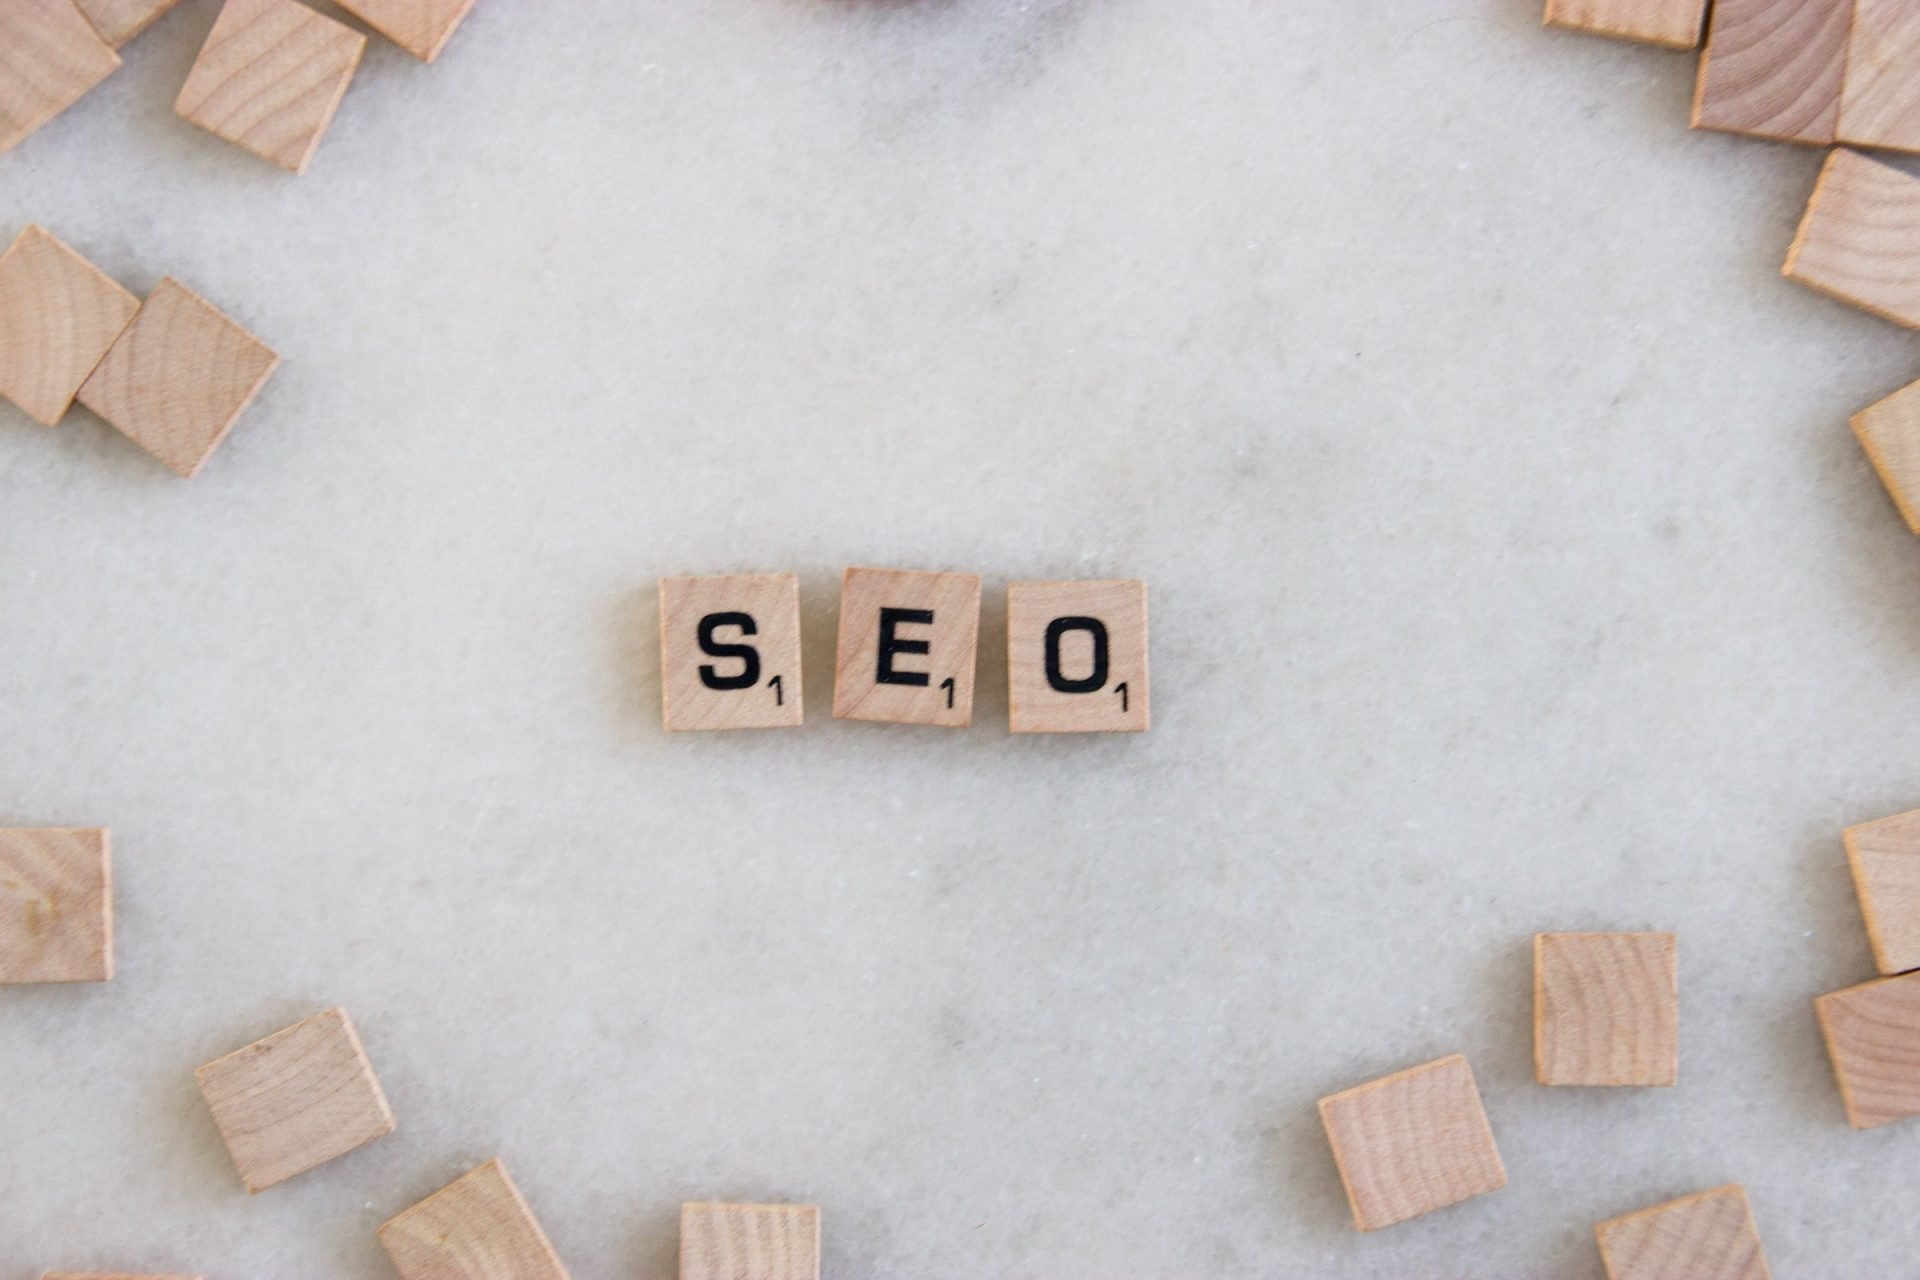 Abbreviation Seo In Scrabble Tiles